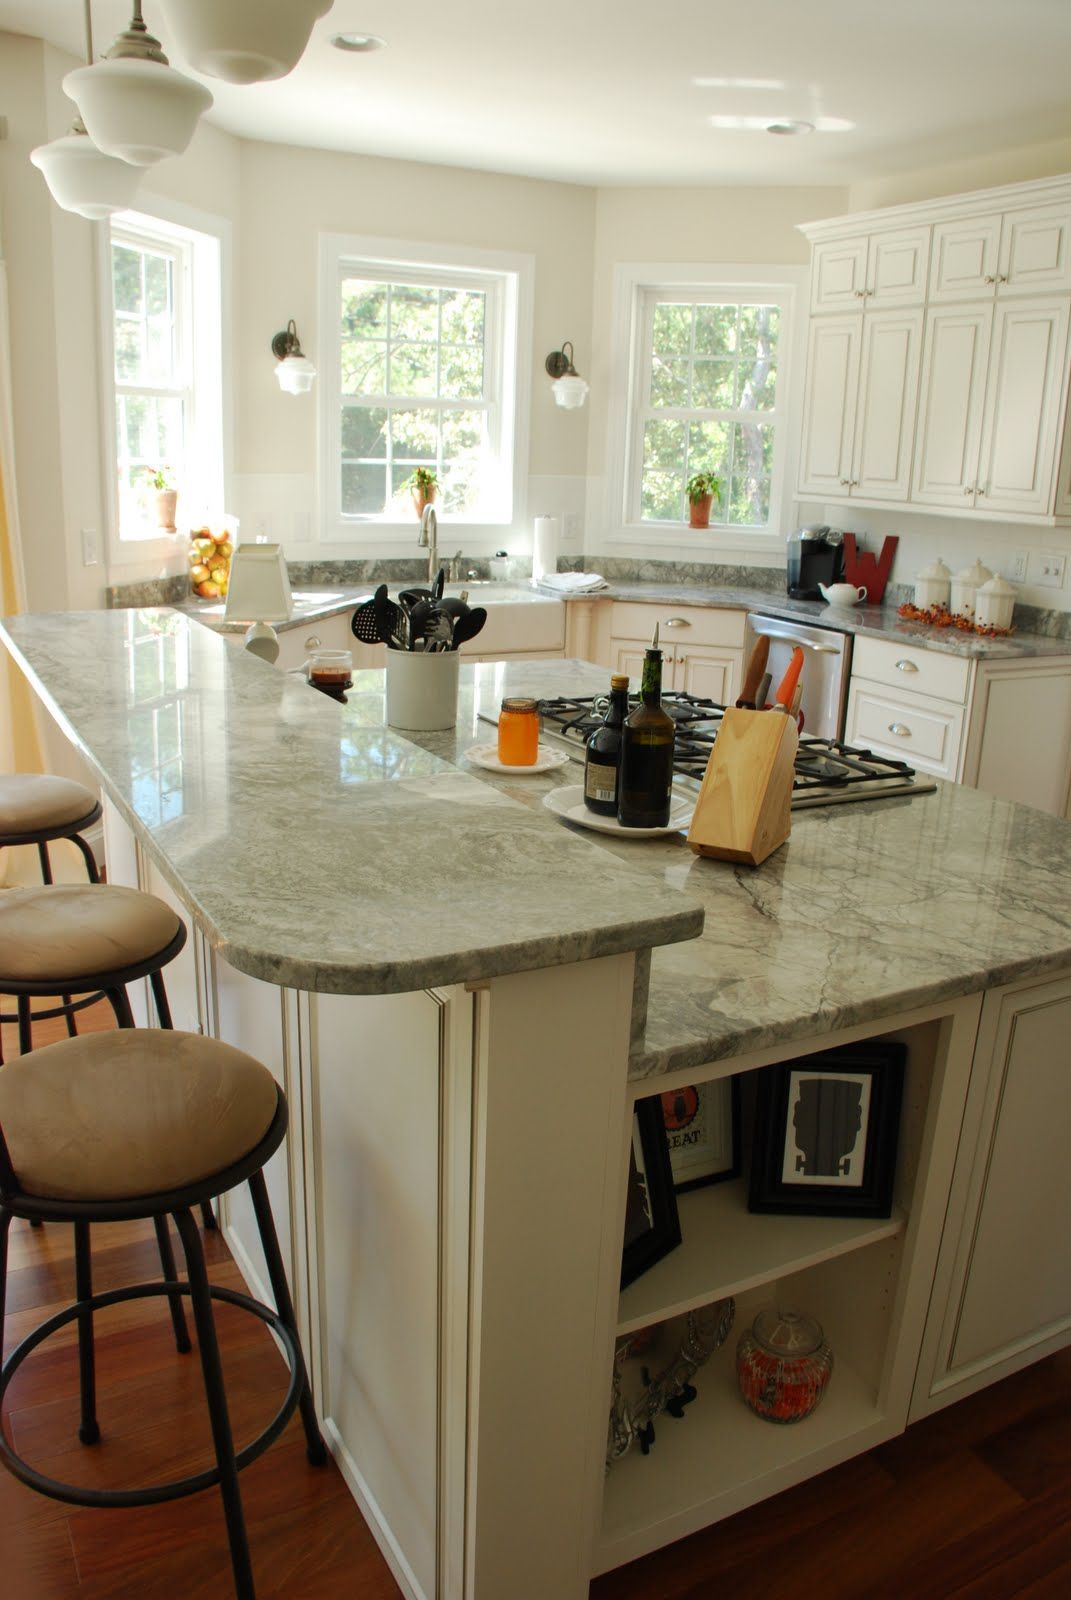 Sherwin Williams White Duck Benjamin Moore Moonshine Kitchen Design Small Kitchen Remodel Kitchen Inspirations